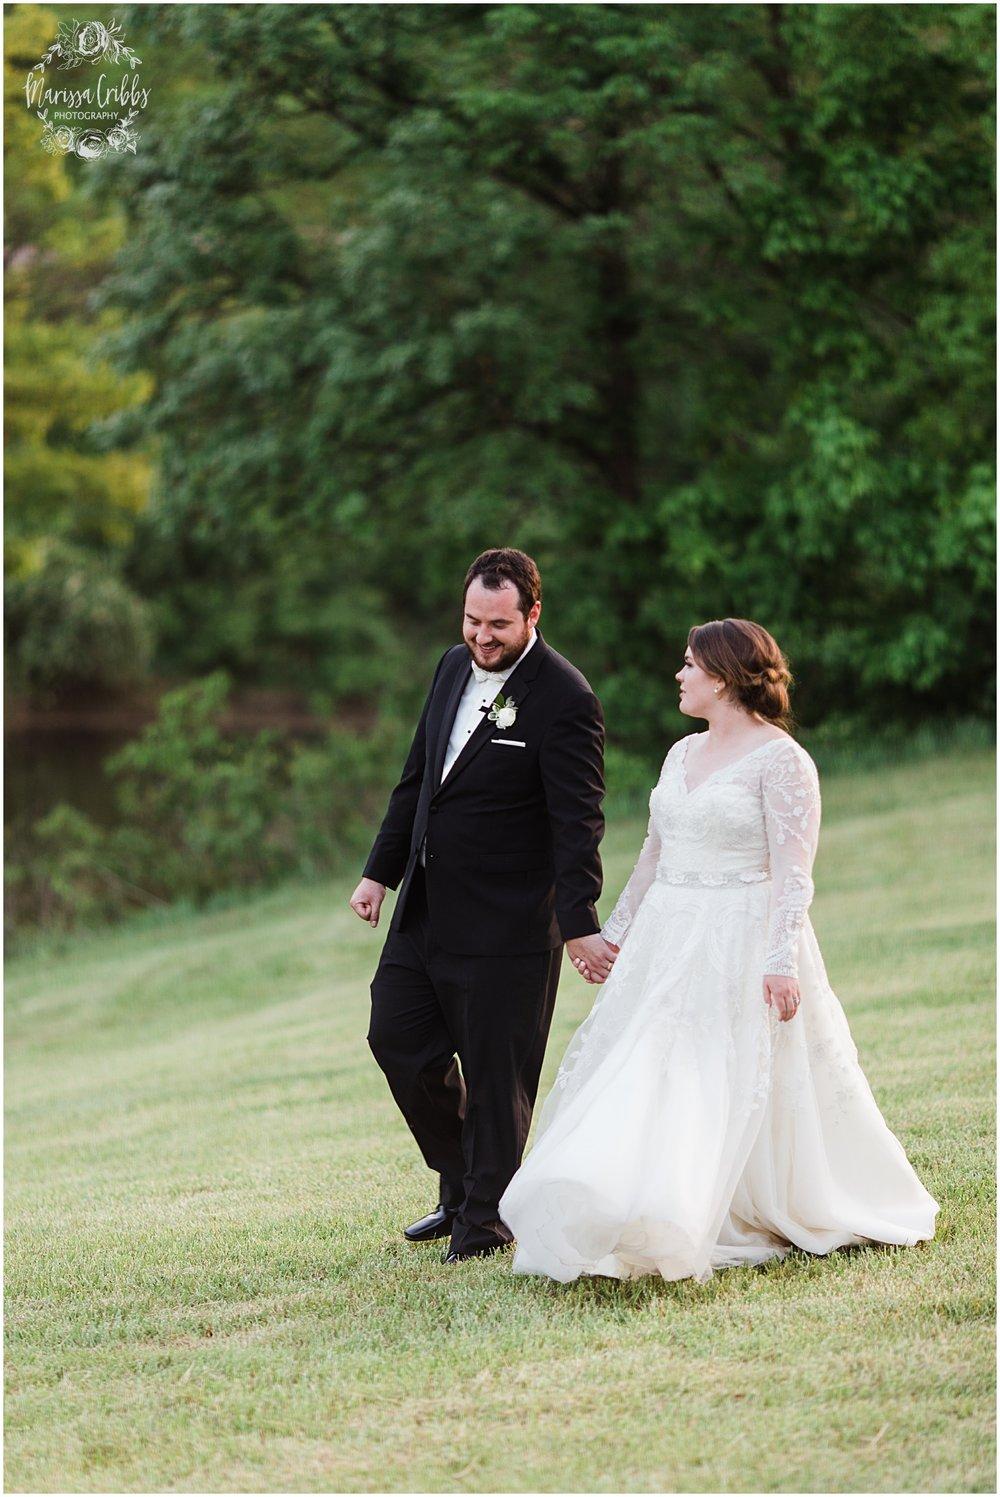 GORBY WEDDING | MARISSA CRIBBS PHOTOGRAPHY_5130.jpg